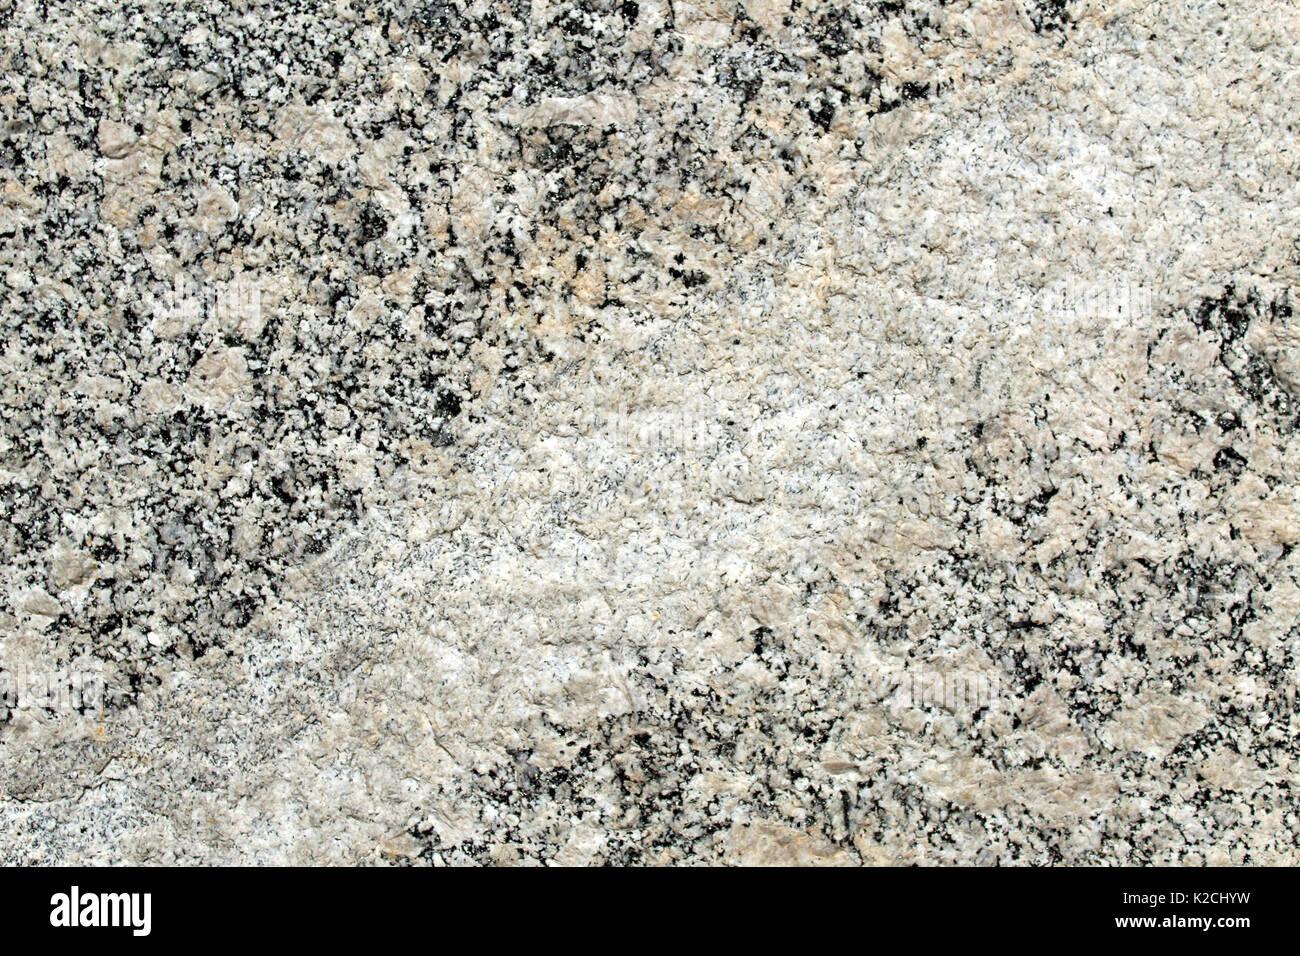 Vein intrusion in ghiandone metamorphic rock - Stock Image